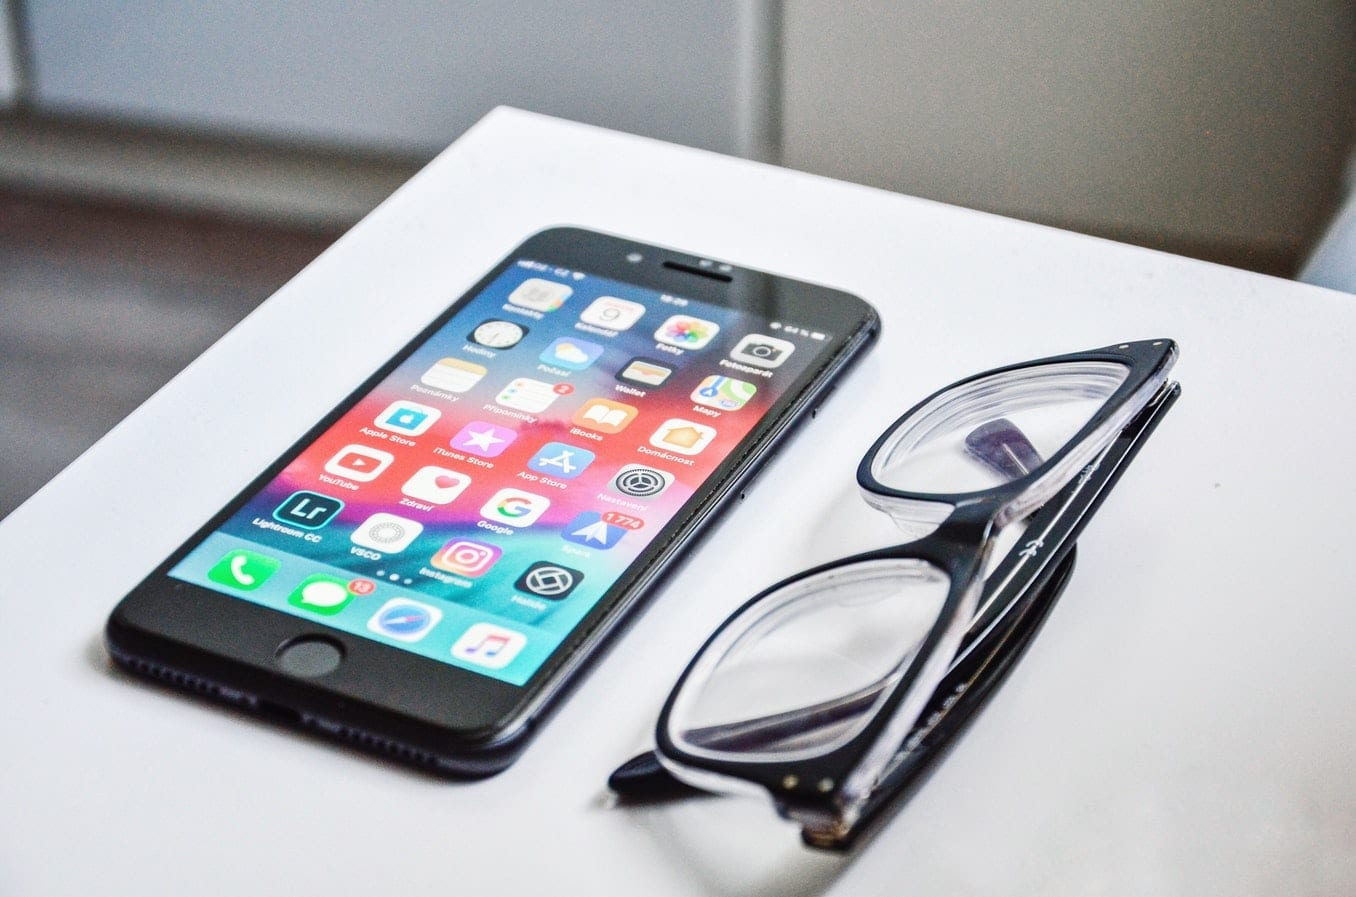 Smartphone displaying apps next to a pair of eyeglasses; image by David Švihovec, via Unsplash.com.